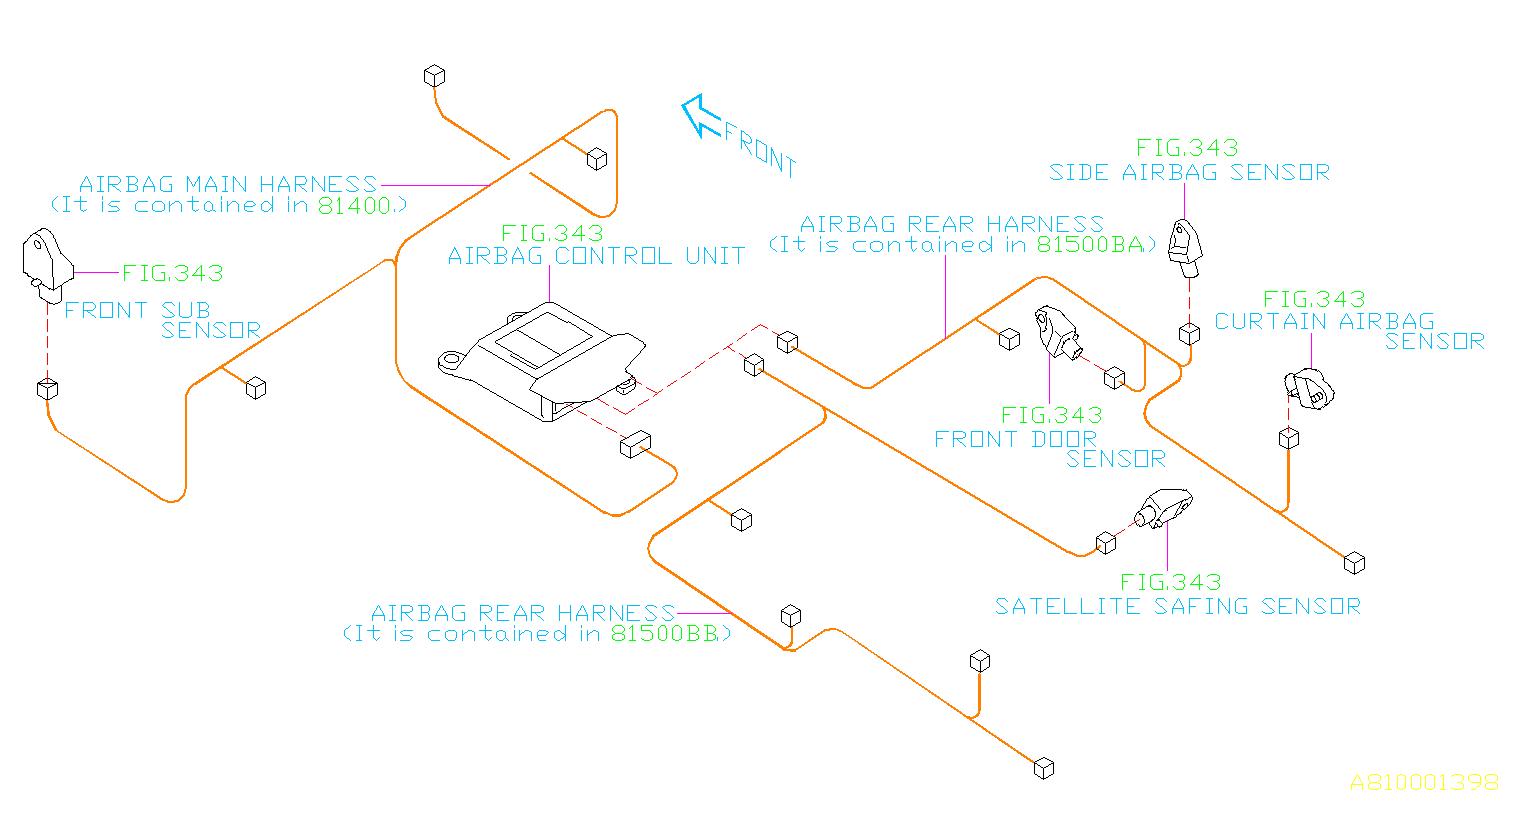 subaru brz wiring diagram    subaru       brz    harness bulkhead    wiring     main 81402ca391     subaru       brz    harness bulkhead    wiring     main 81402ca391